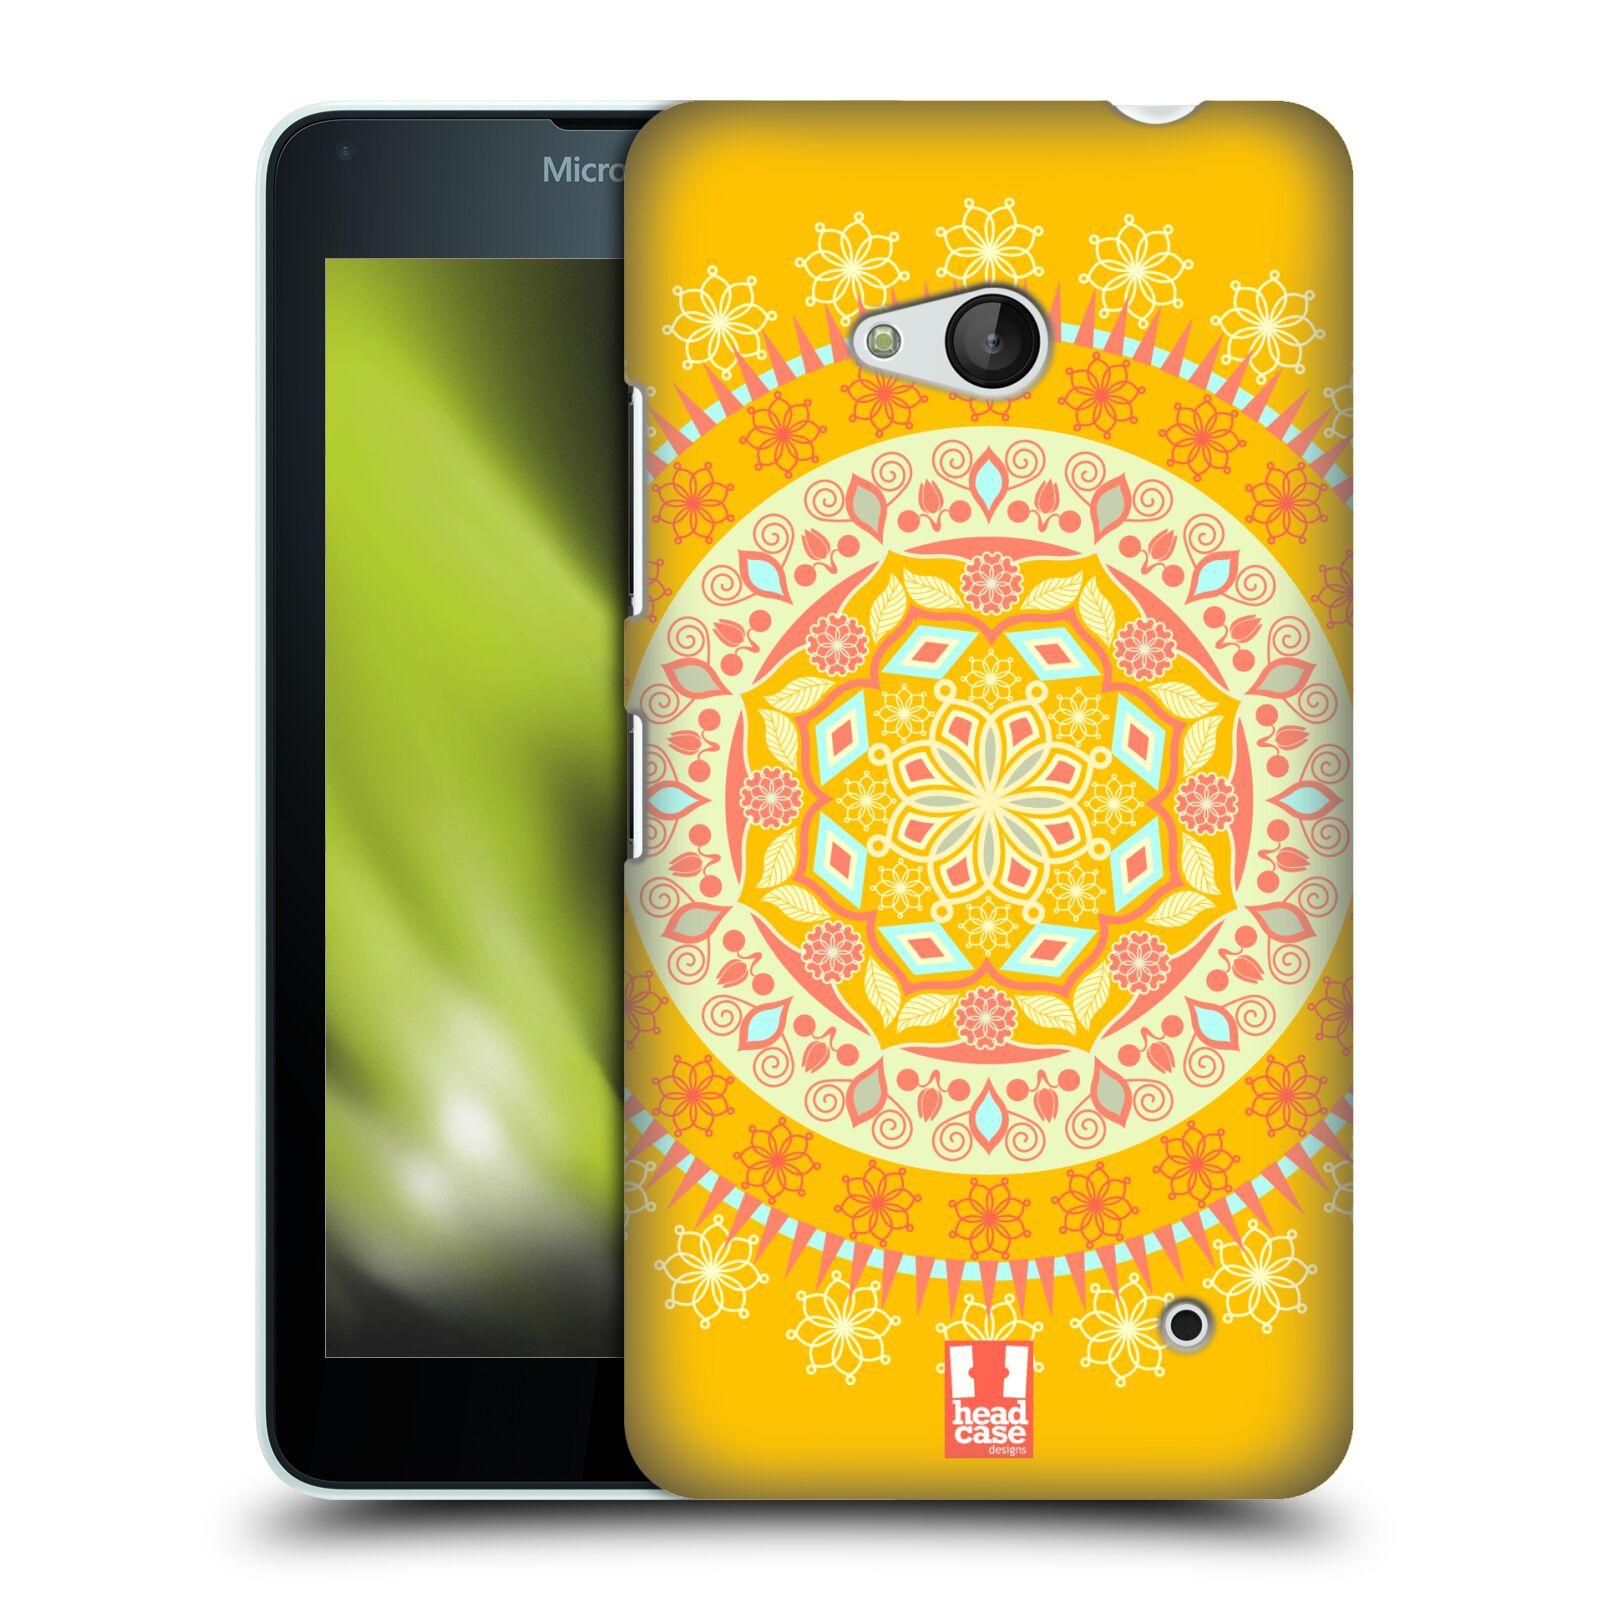 Nokia lumia 730 dual sim details and information